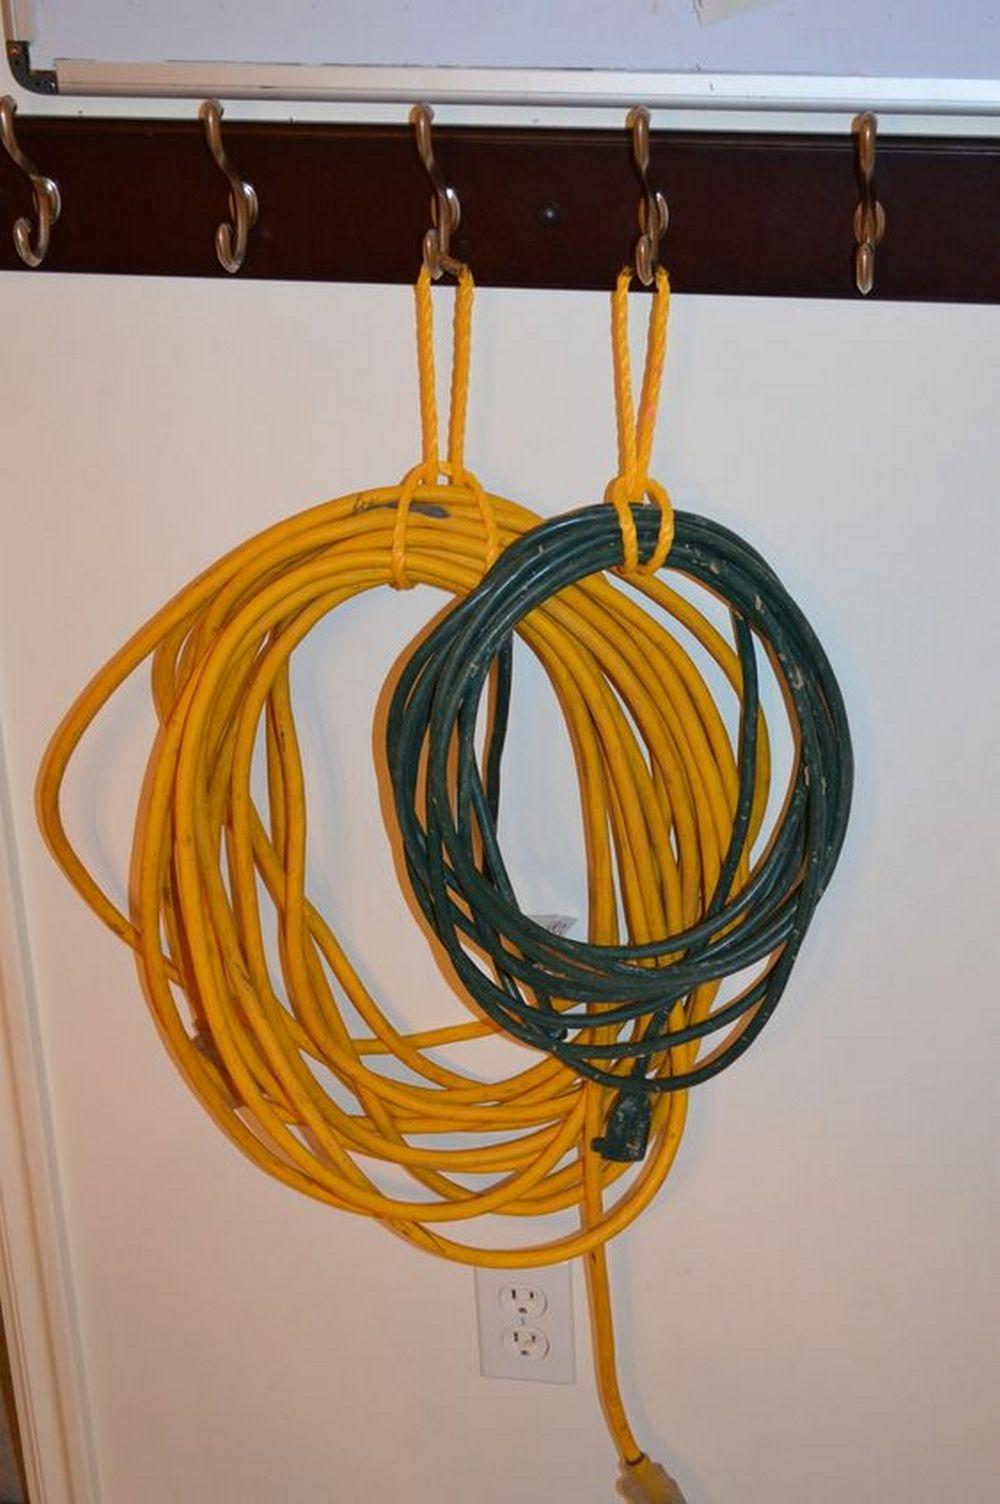 Diy Folding Extension Cord Organizer